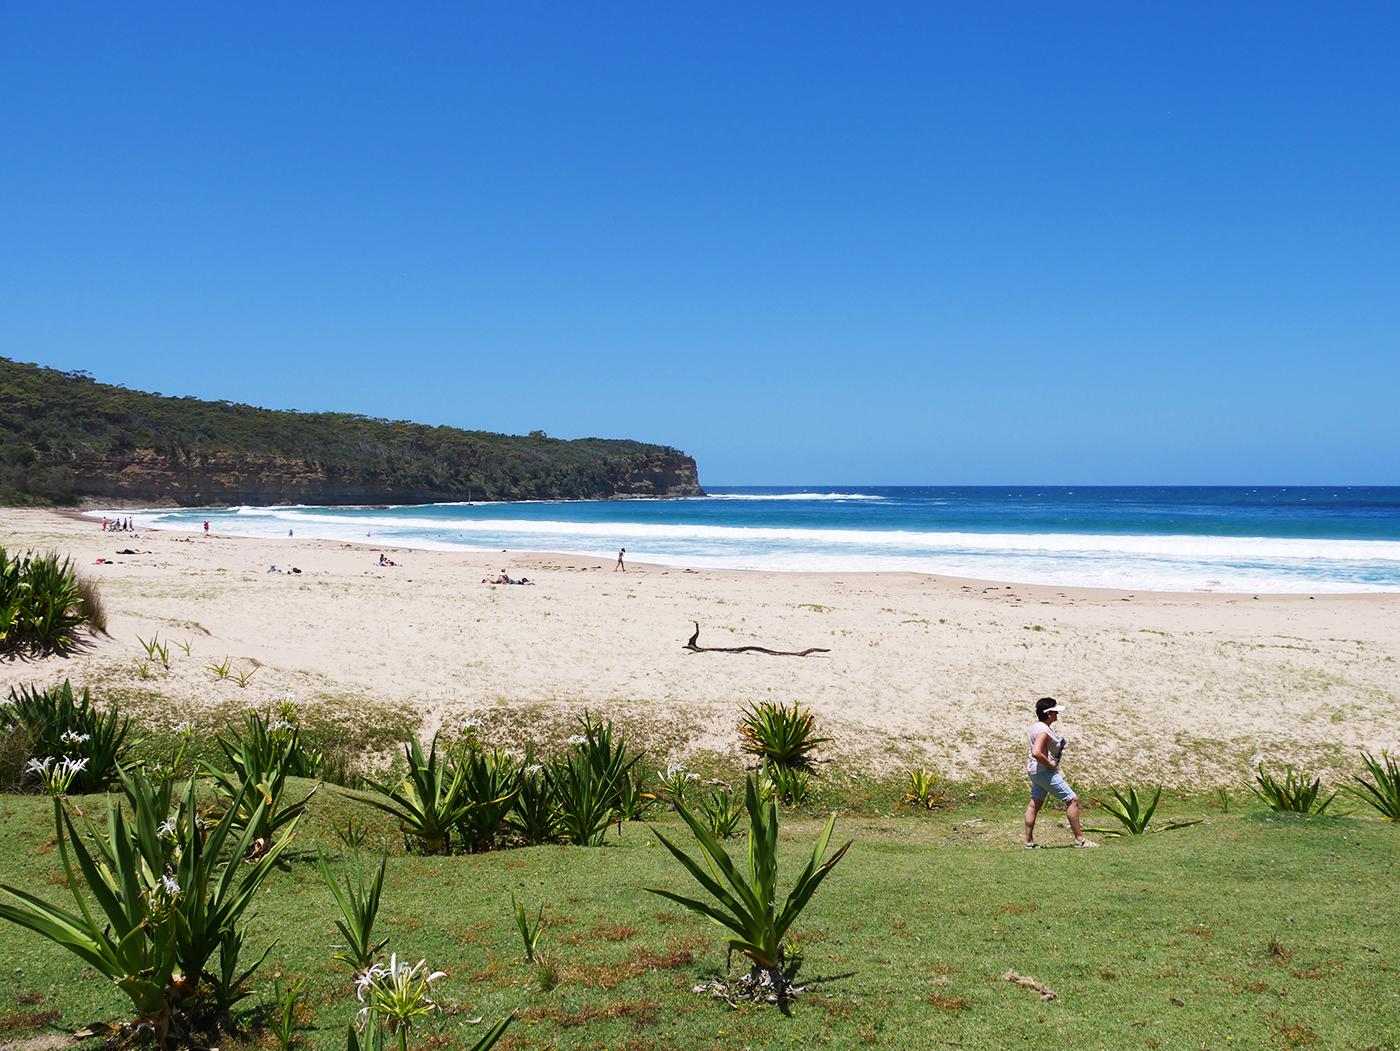 Pebbly Beach in Australië, een paradijselijk plekje